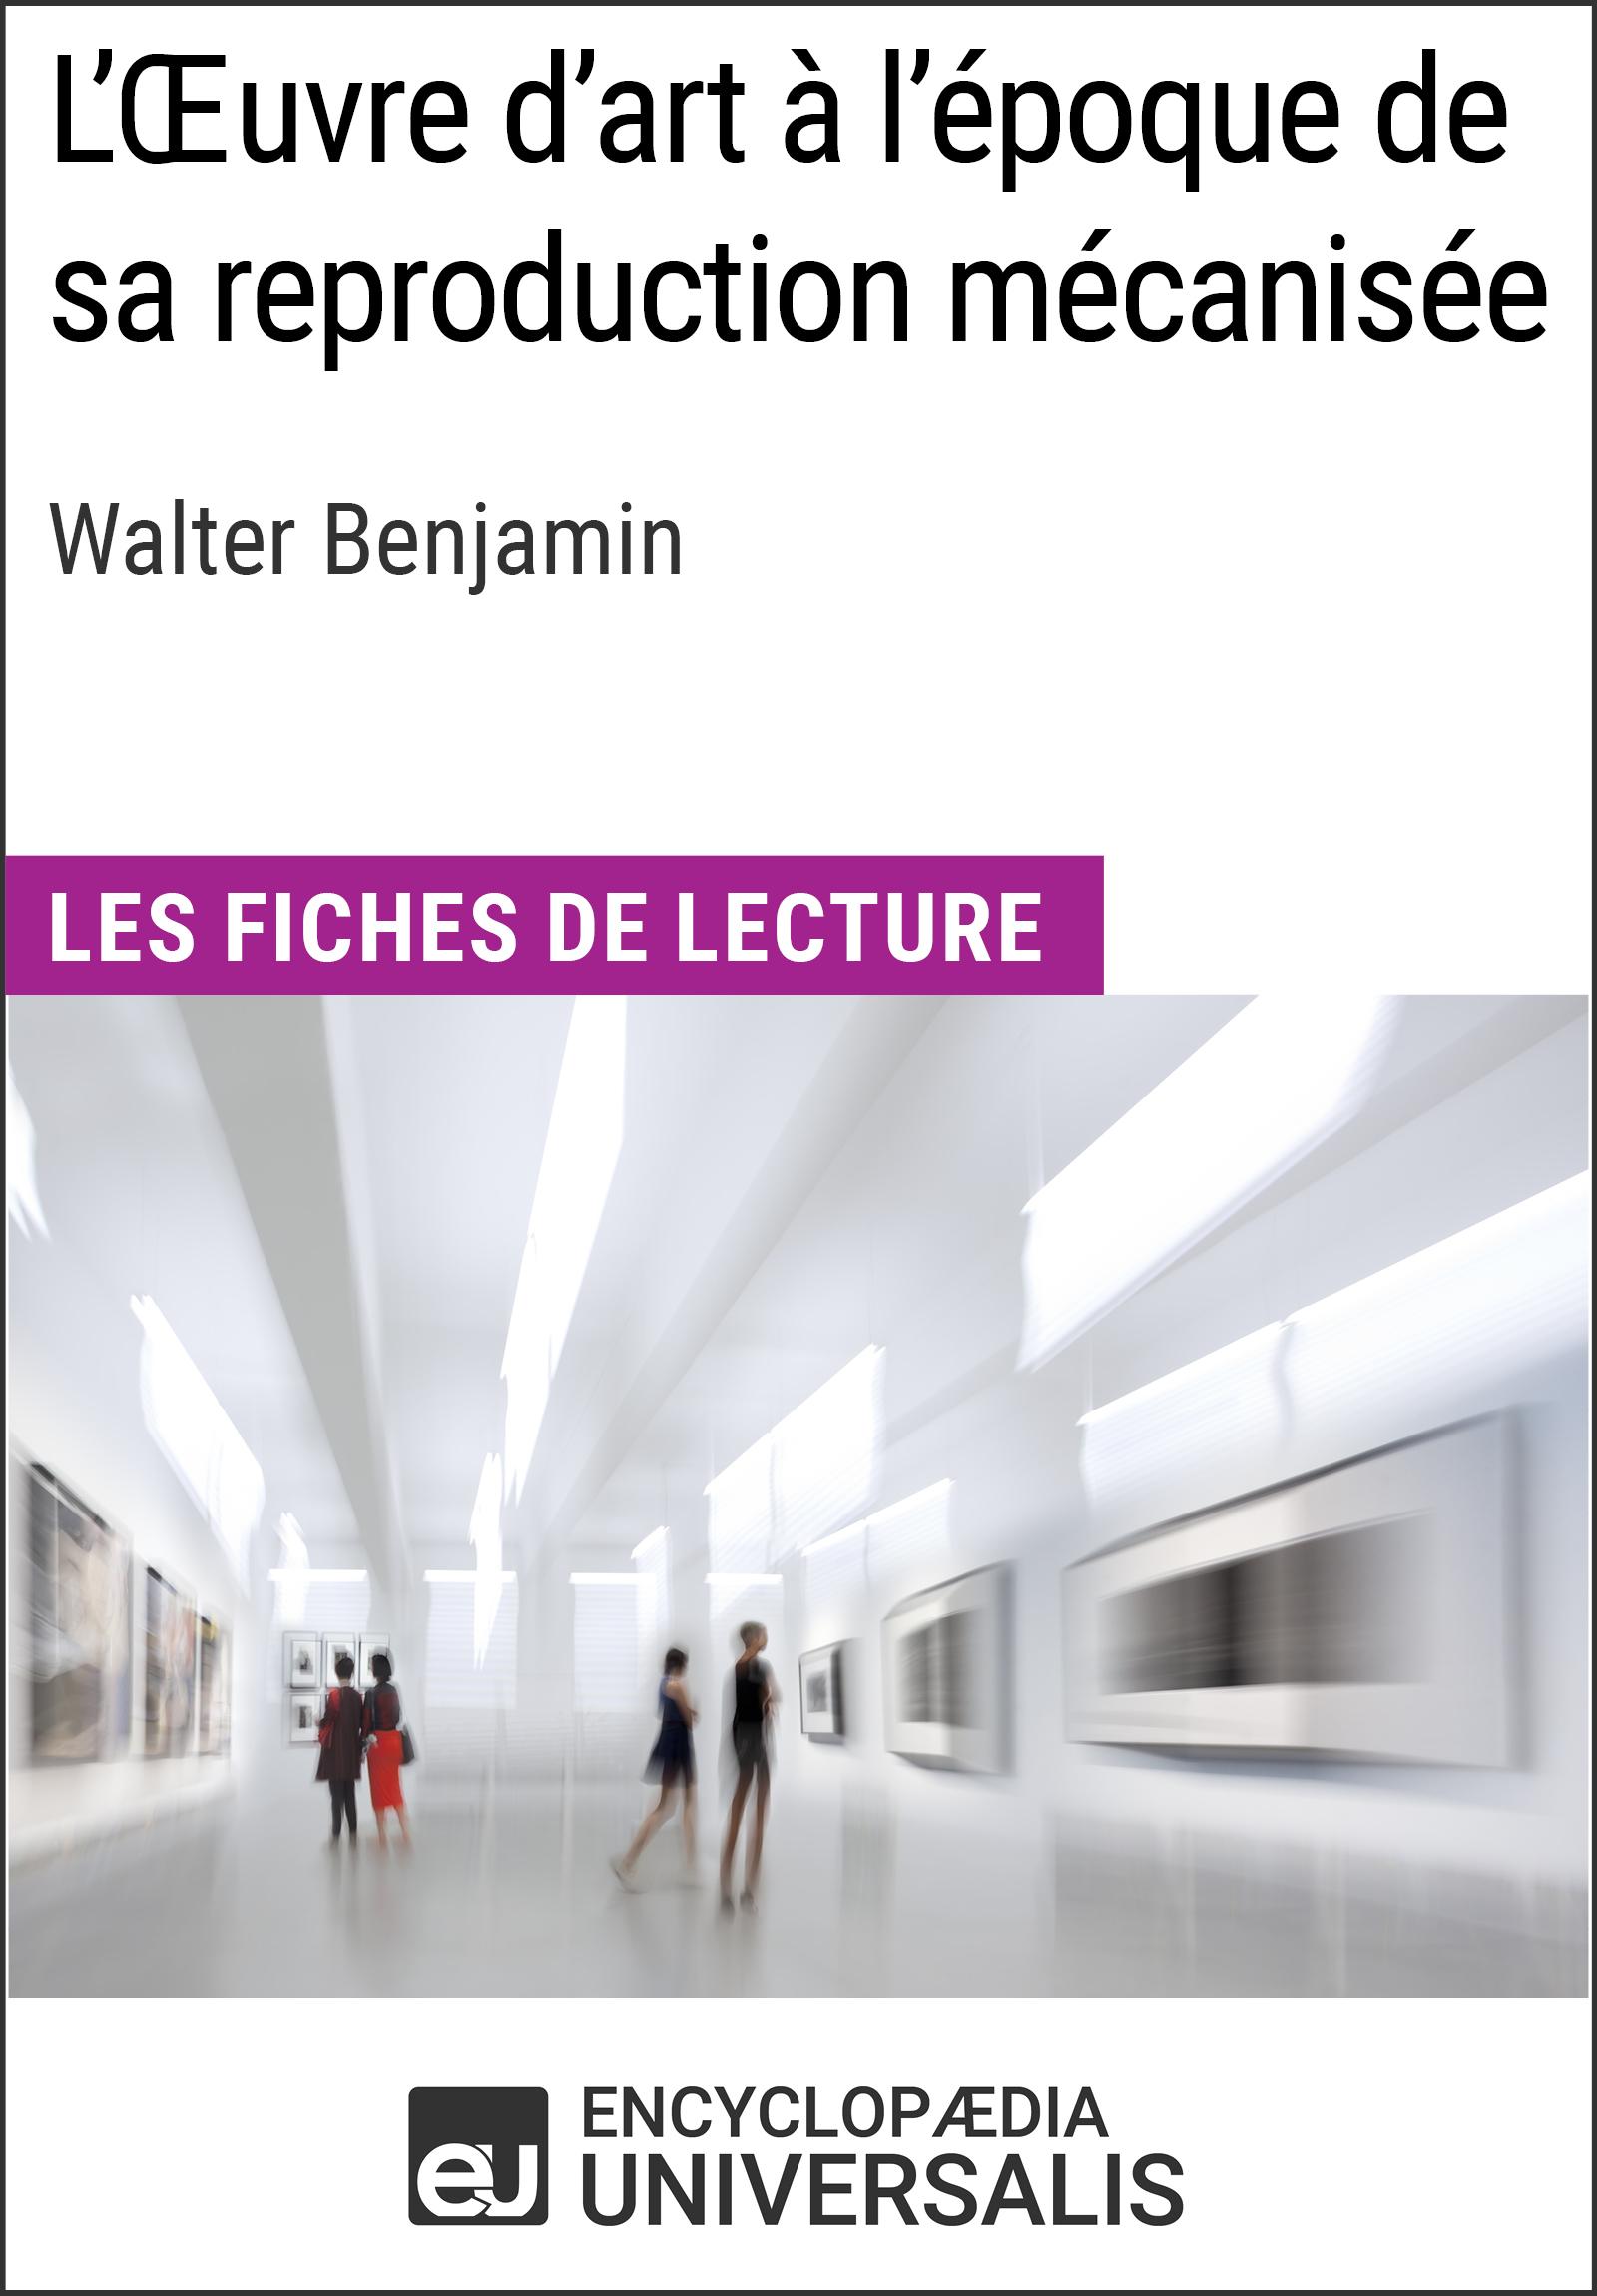 L'Oeuvre d'art à l'époque de sa reproduction mécanisée de Walter Benjamin